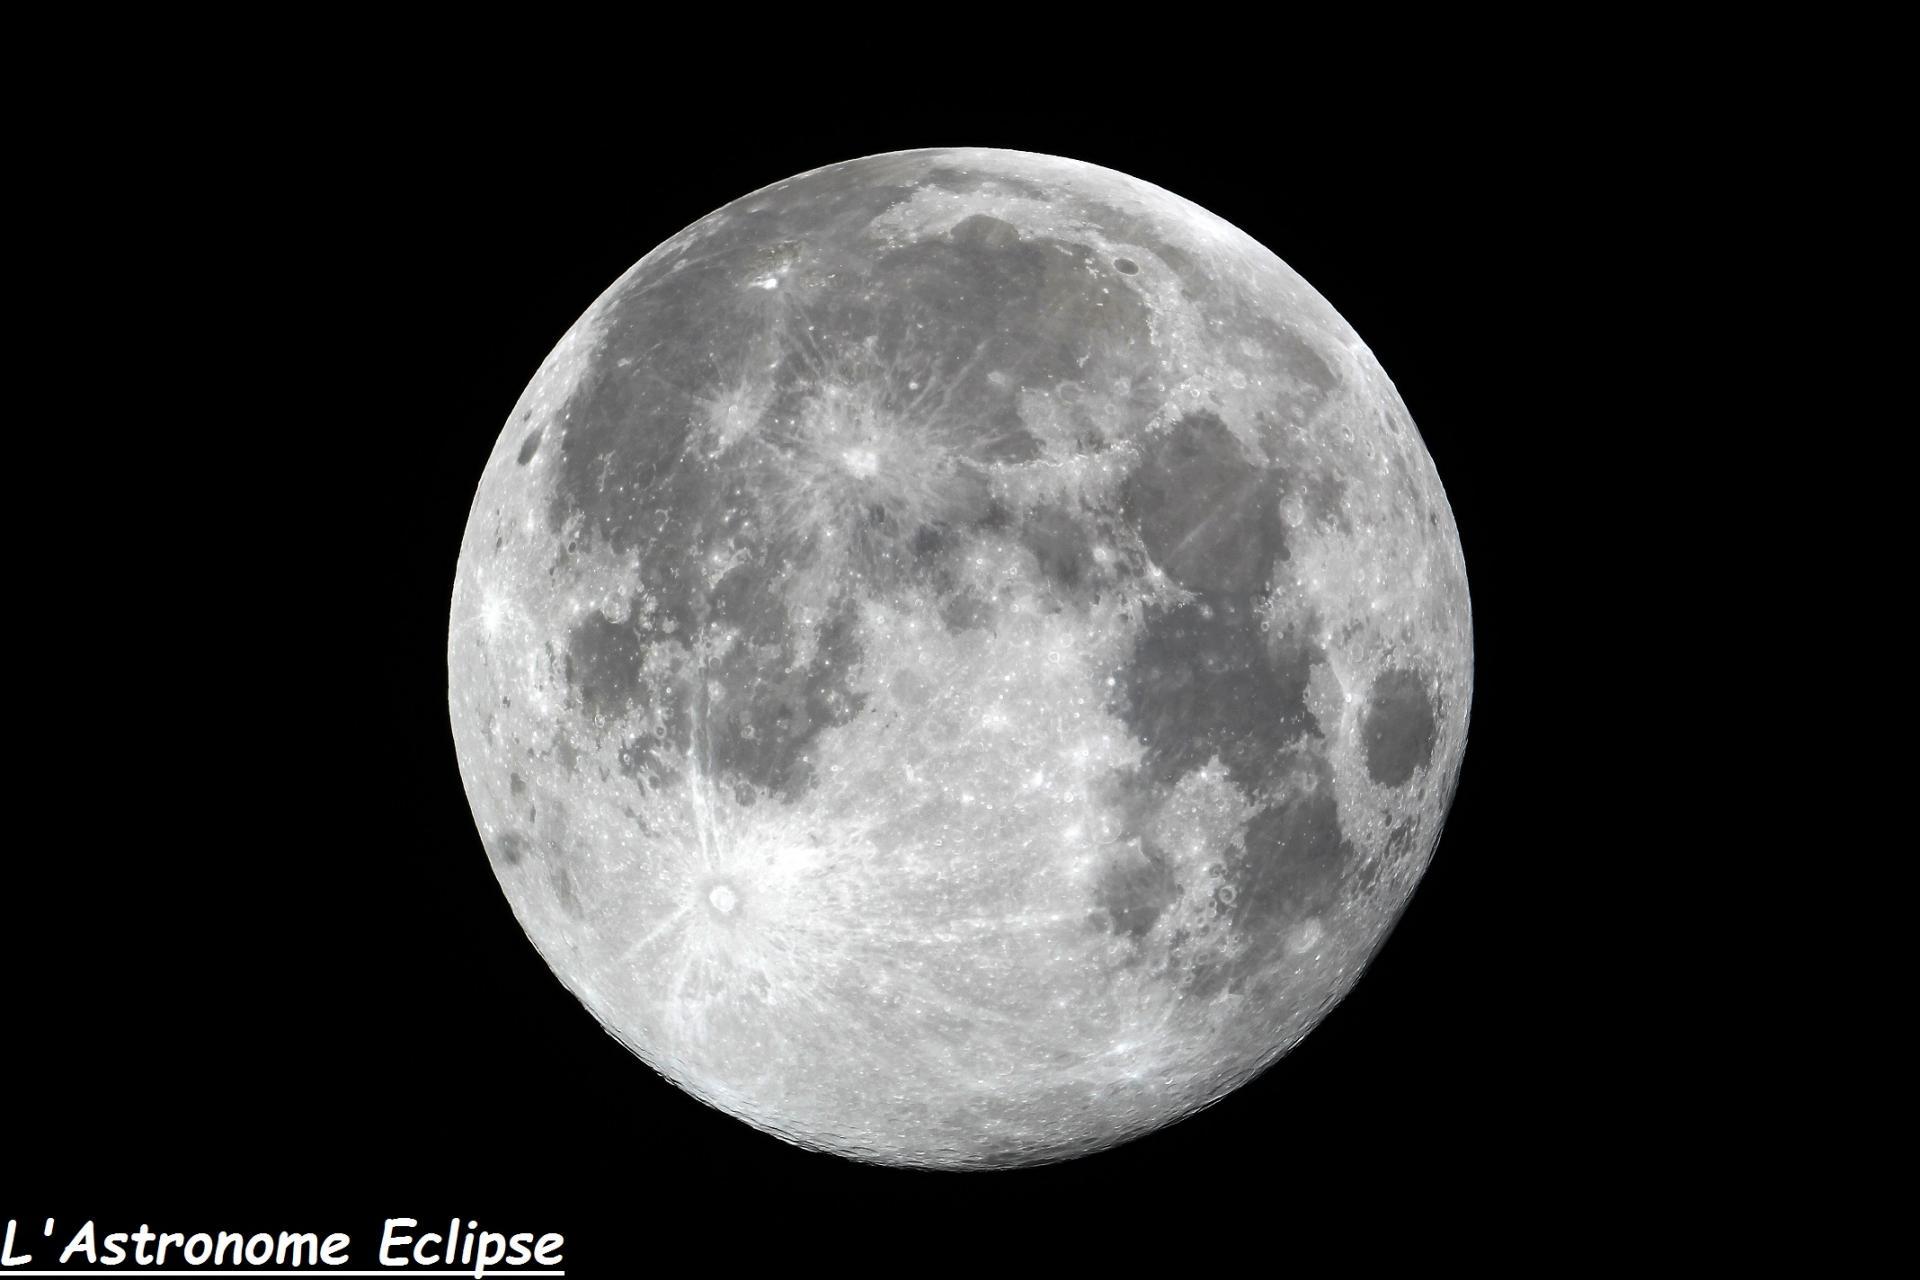 Super-Lune (19 Février 2019)